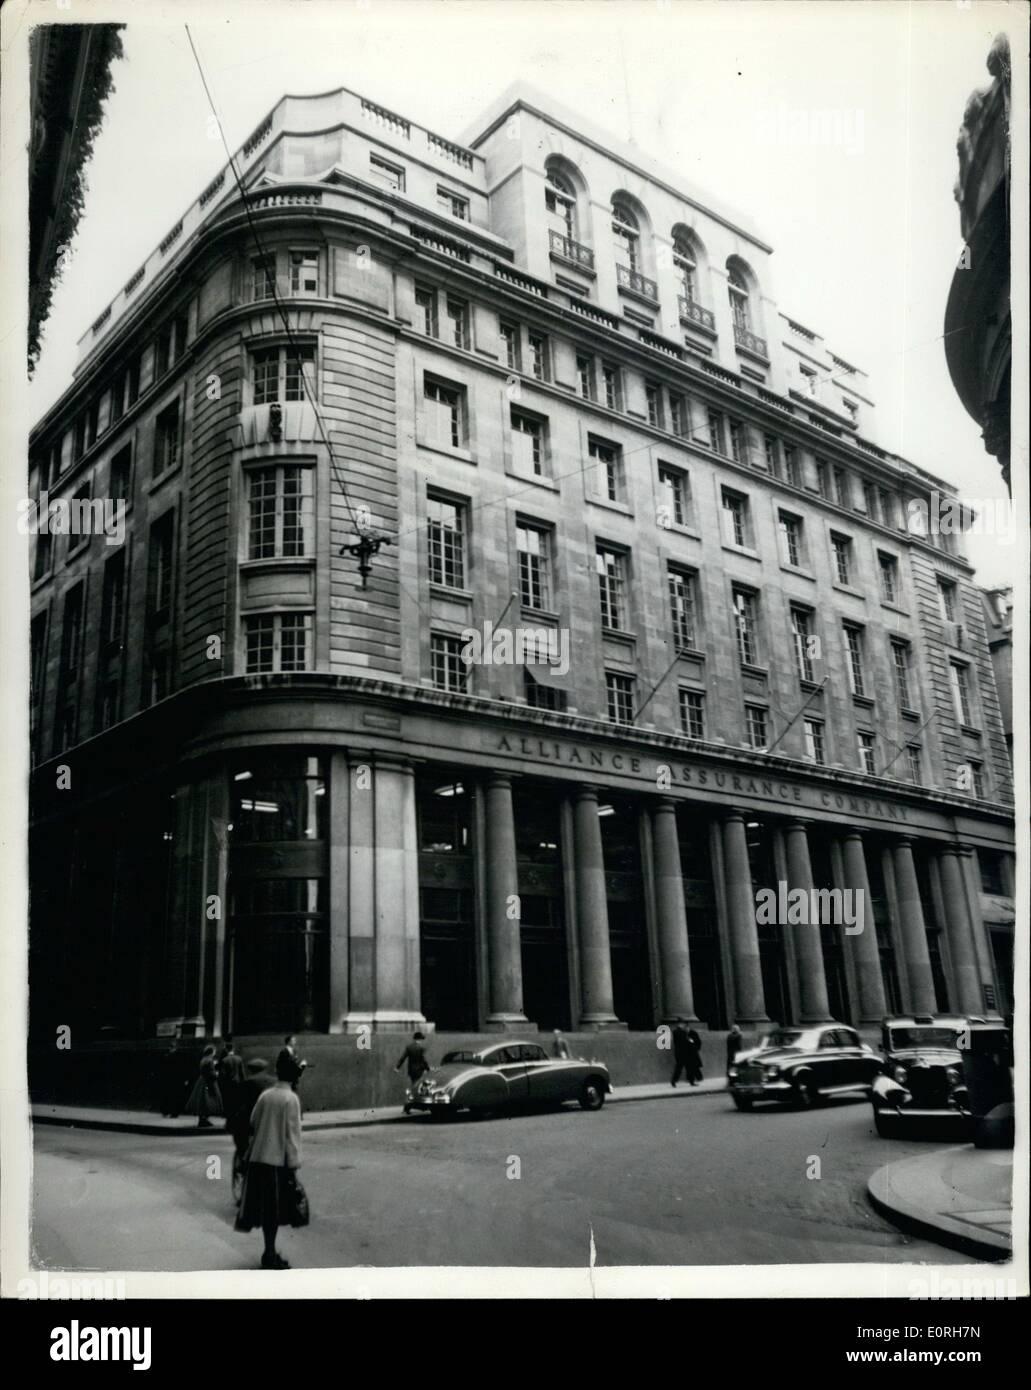 Sep. 09, 1959 - Rothschild House - Stock Image